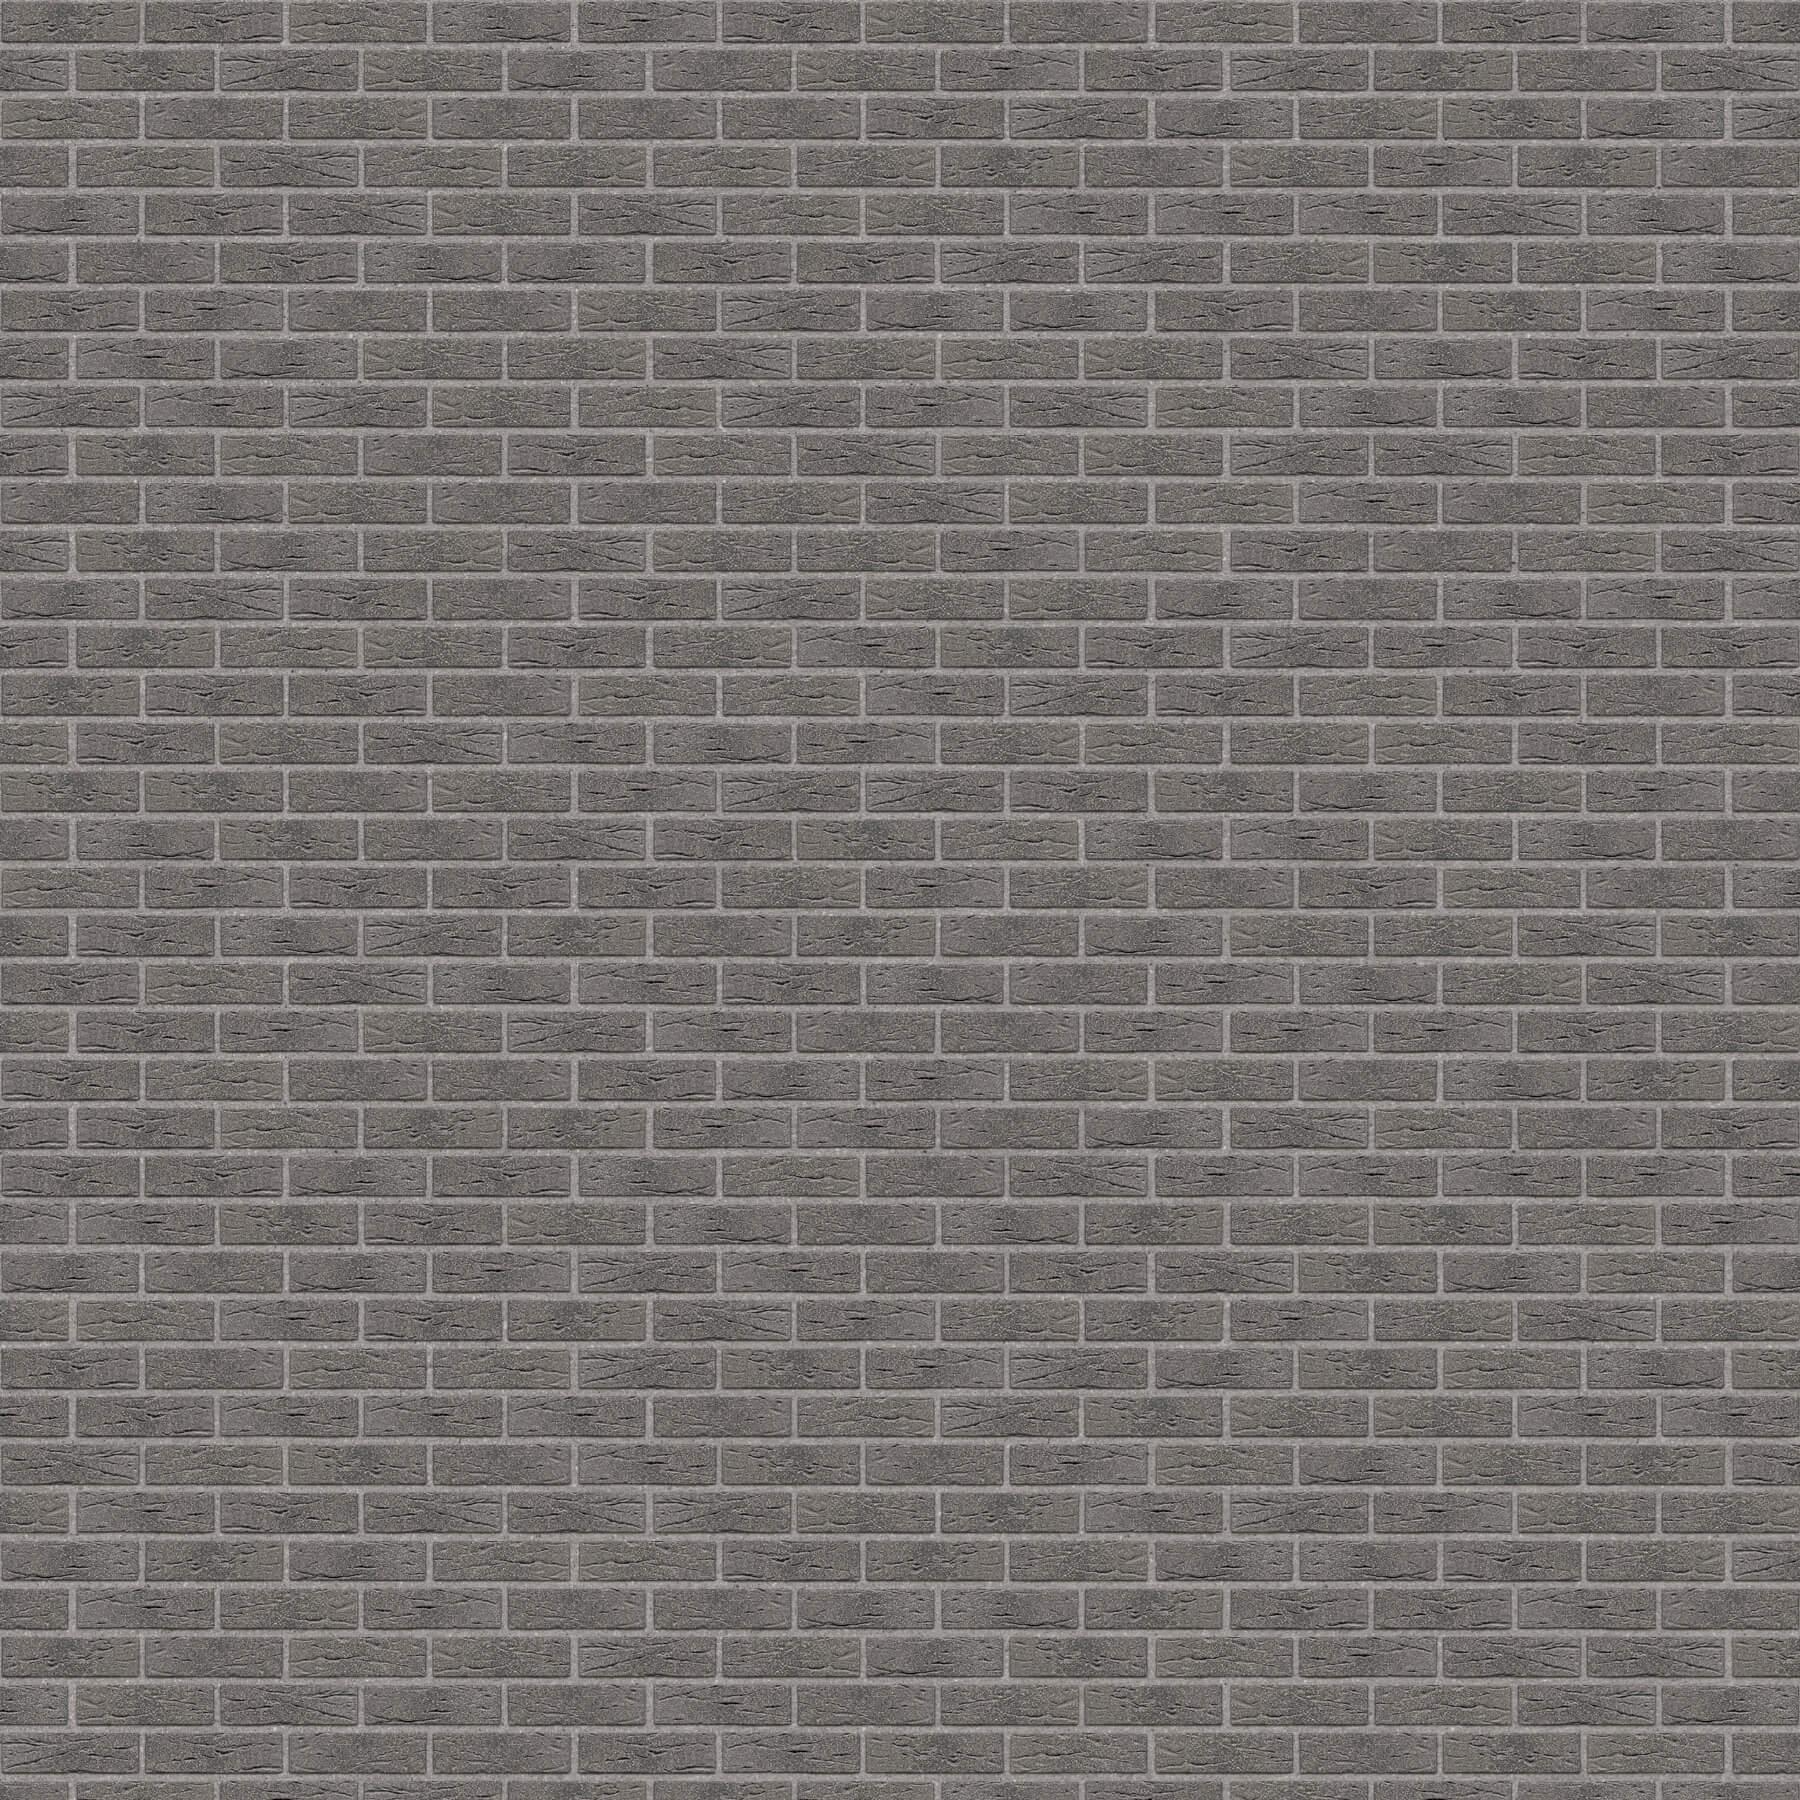 Dekorativna cigla listela FeldHaus Klinker r-735 nf Siva Fuga